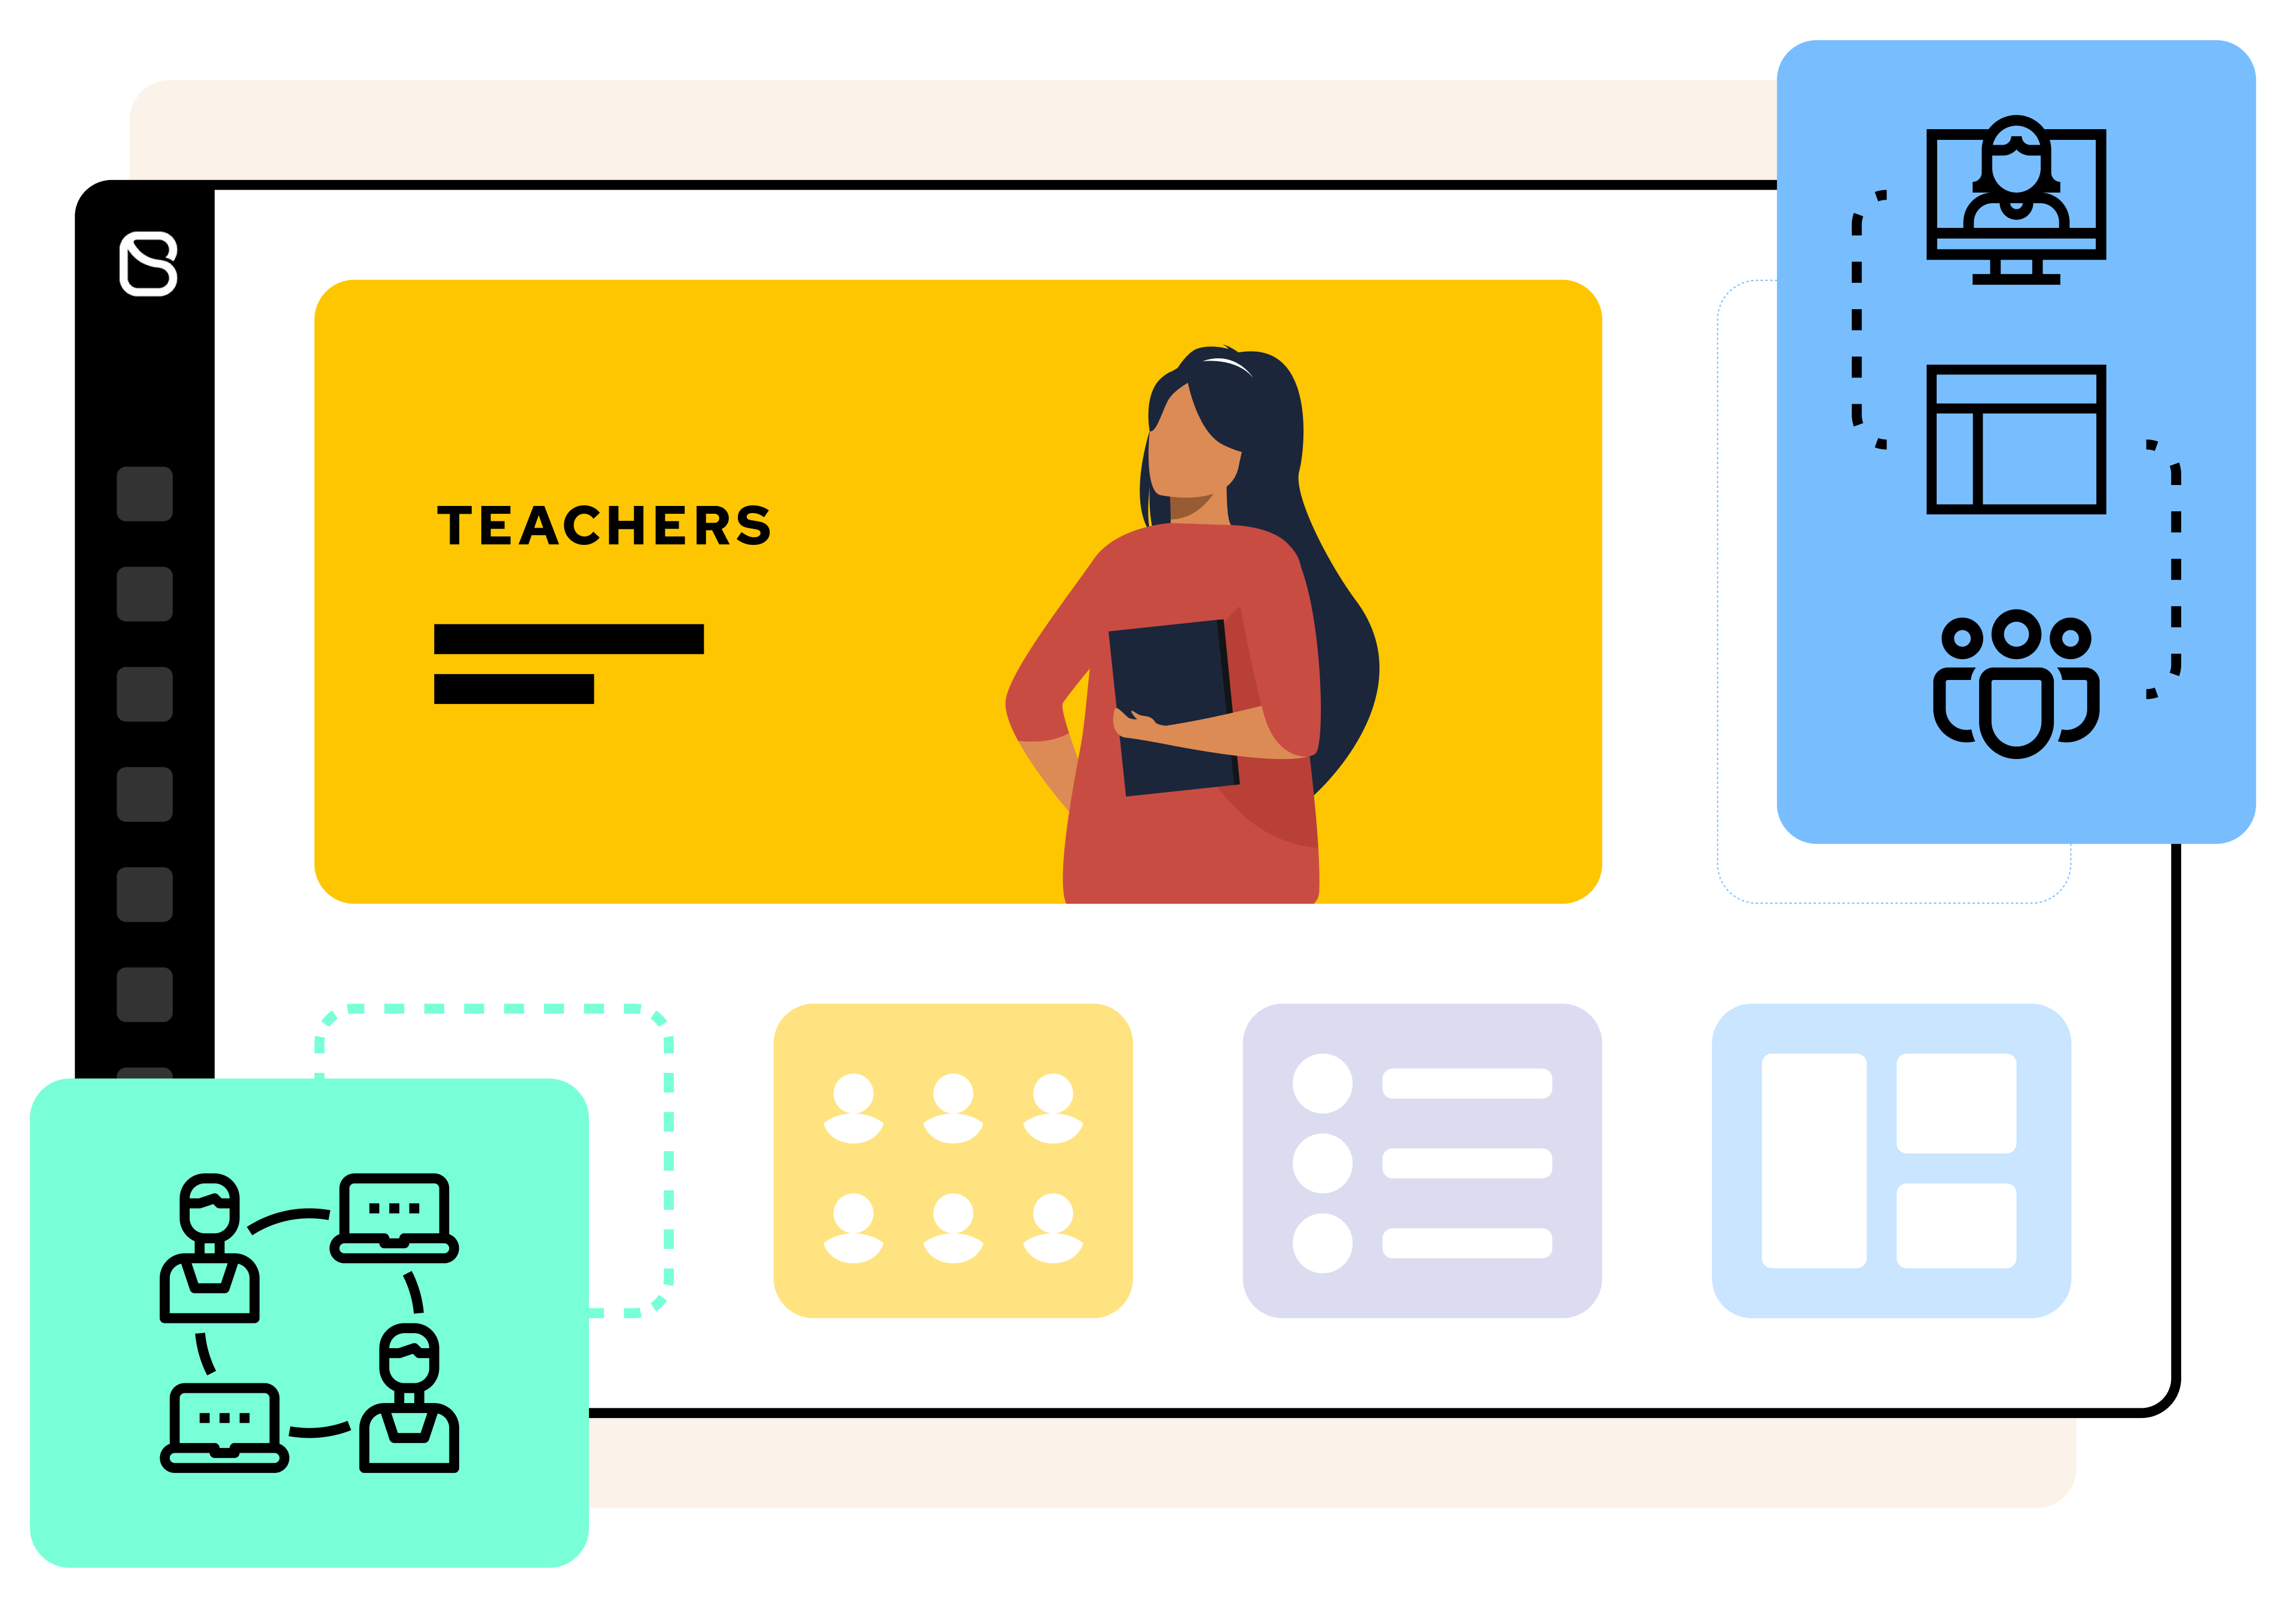 Digital workspaces for teachers